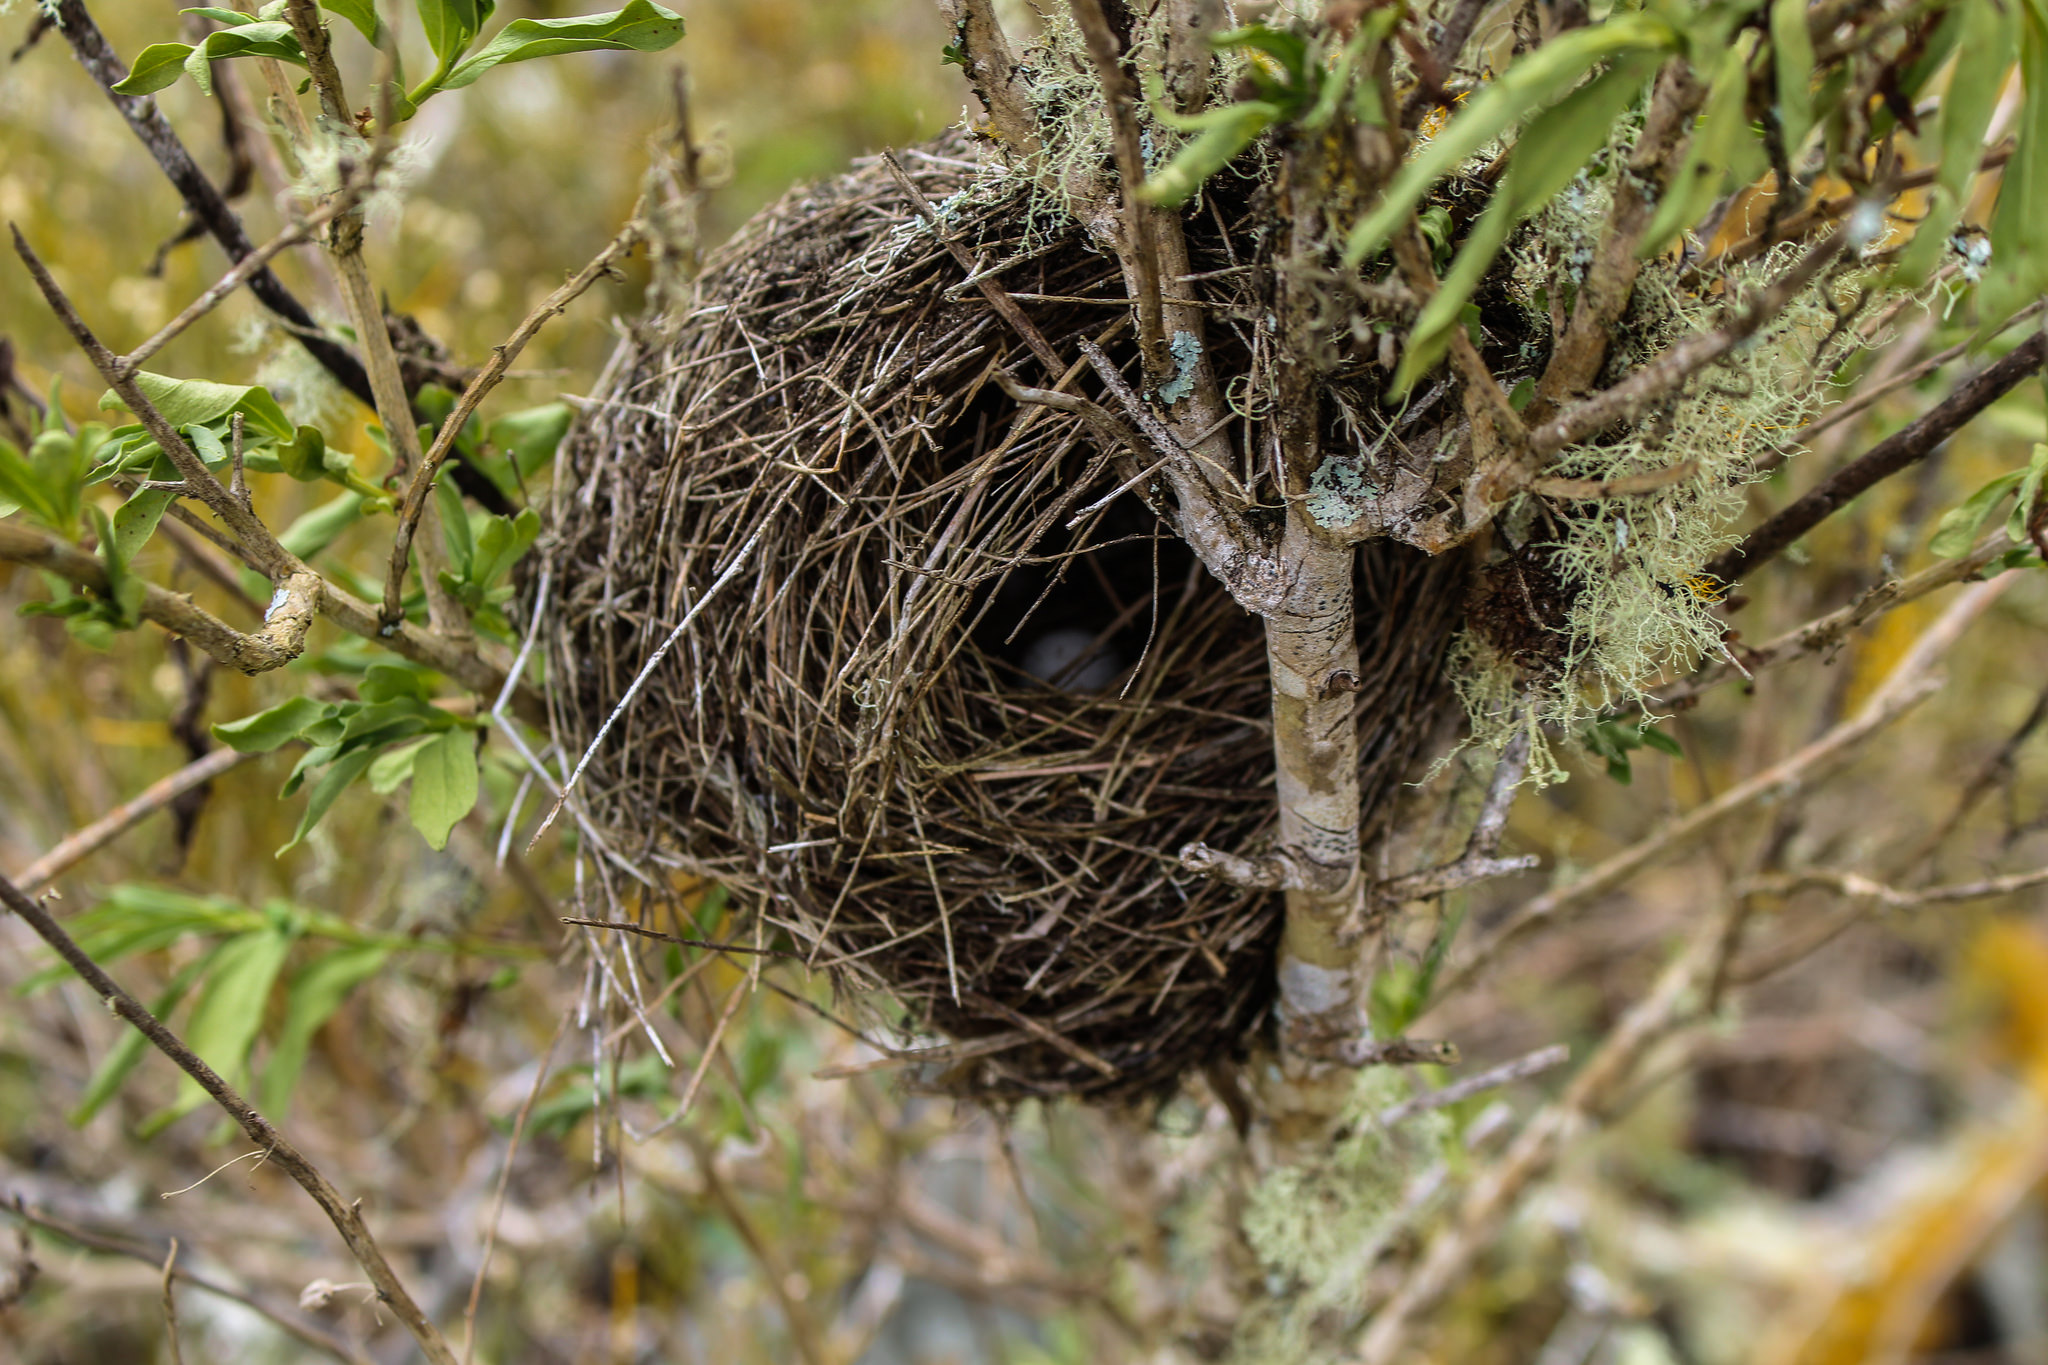 island conservation galapagos bird nest